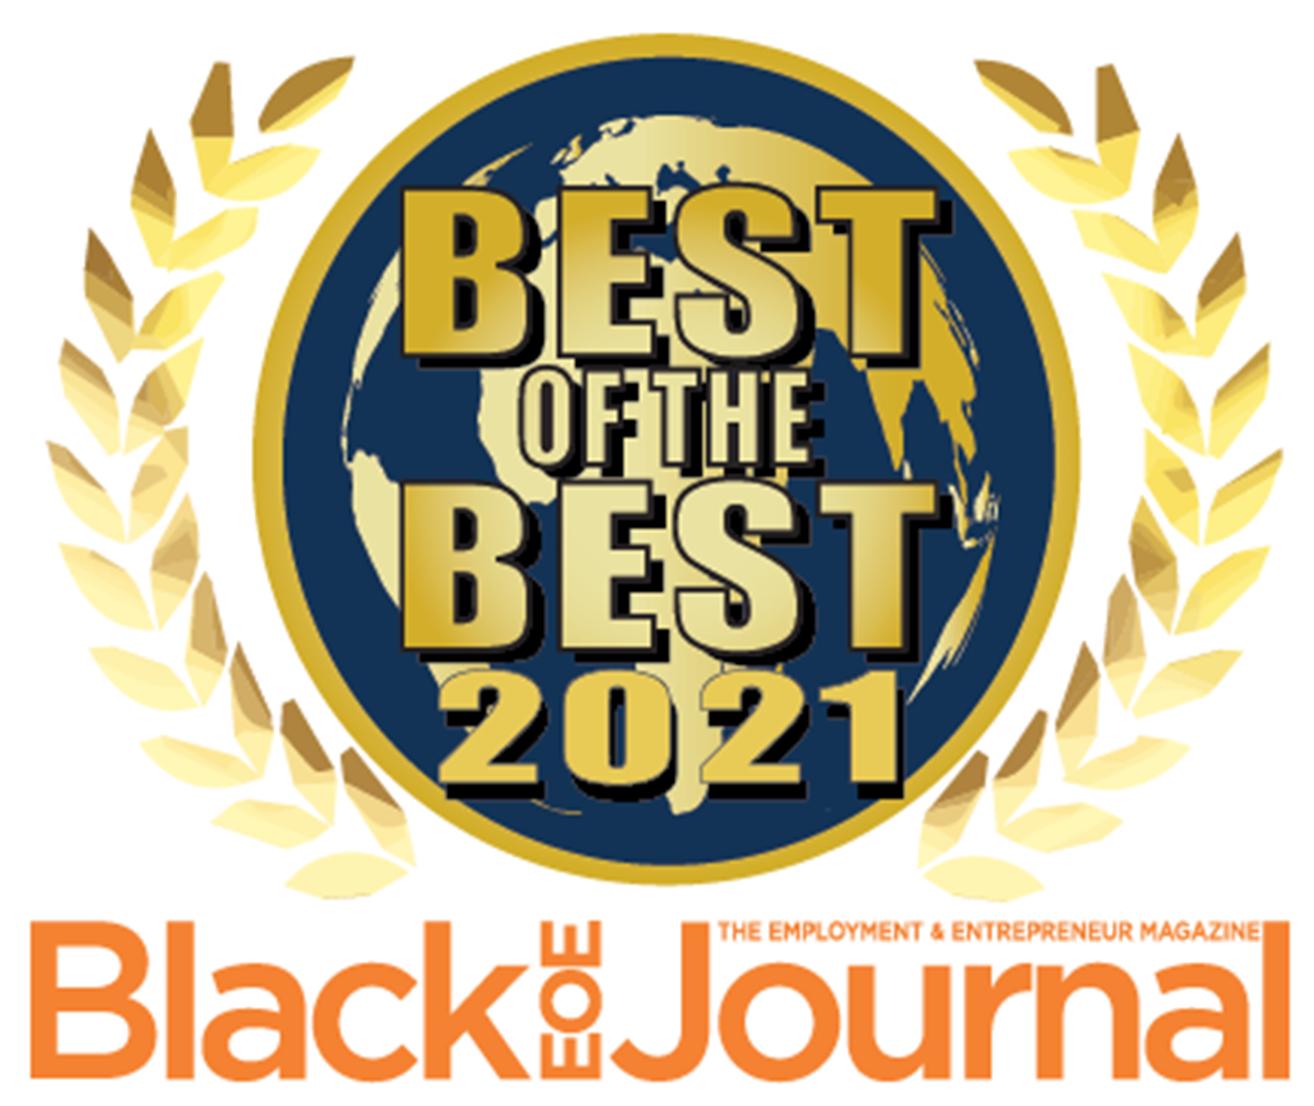 Black EOE Journal Best of the Best 2021